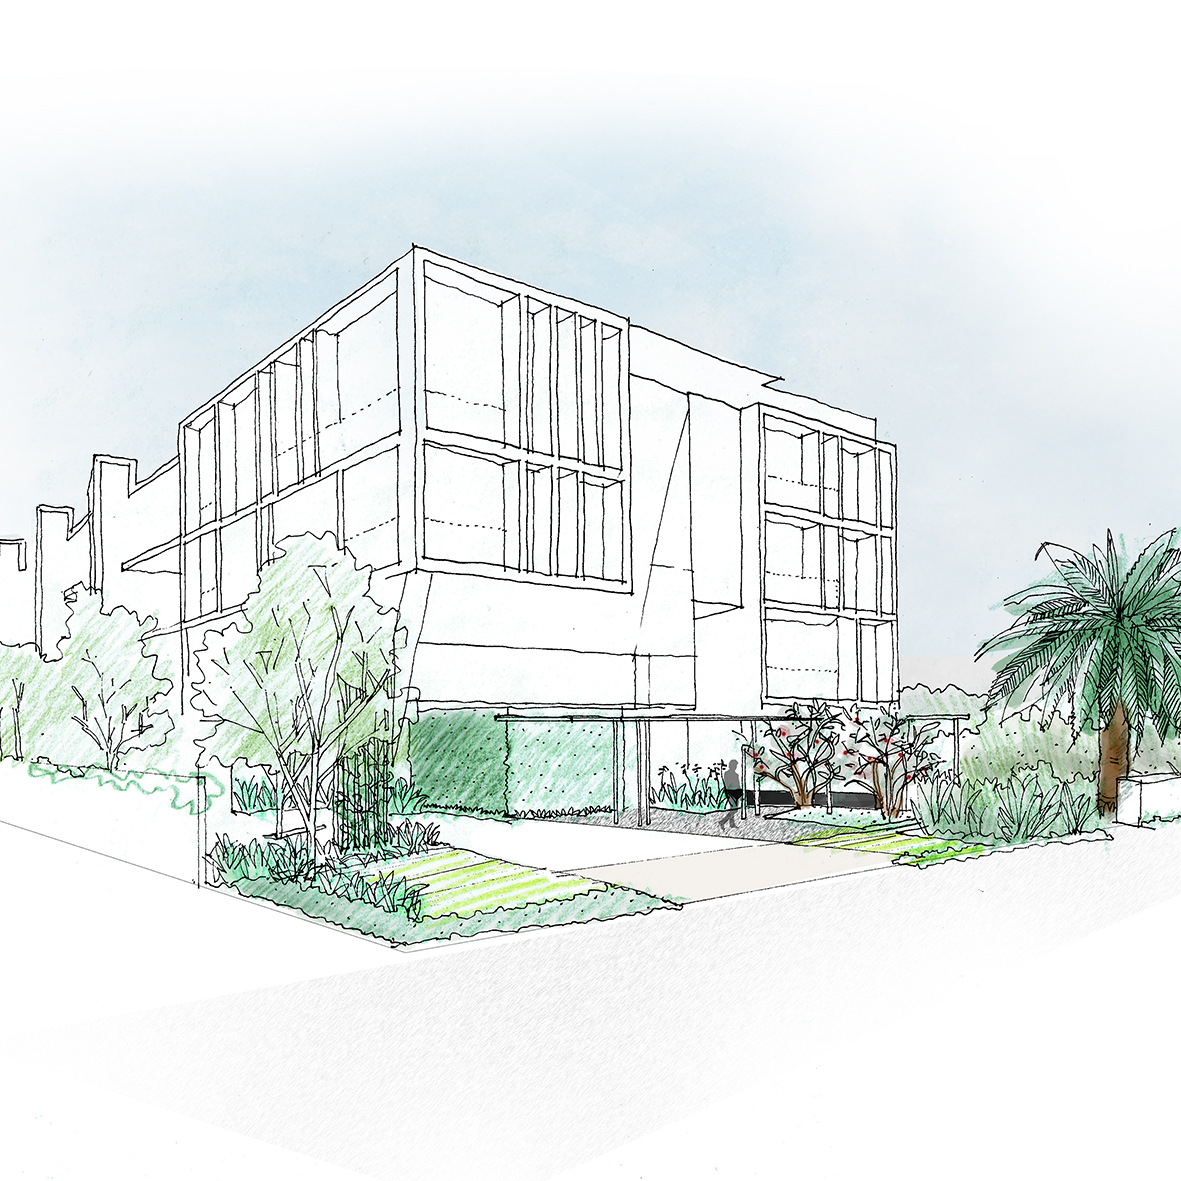 + Melville Parade - Landscape [Multi Residential]